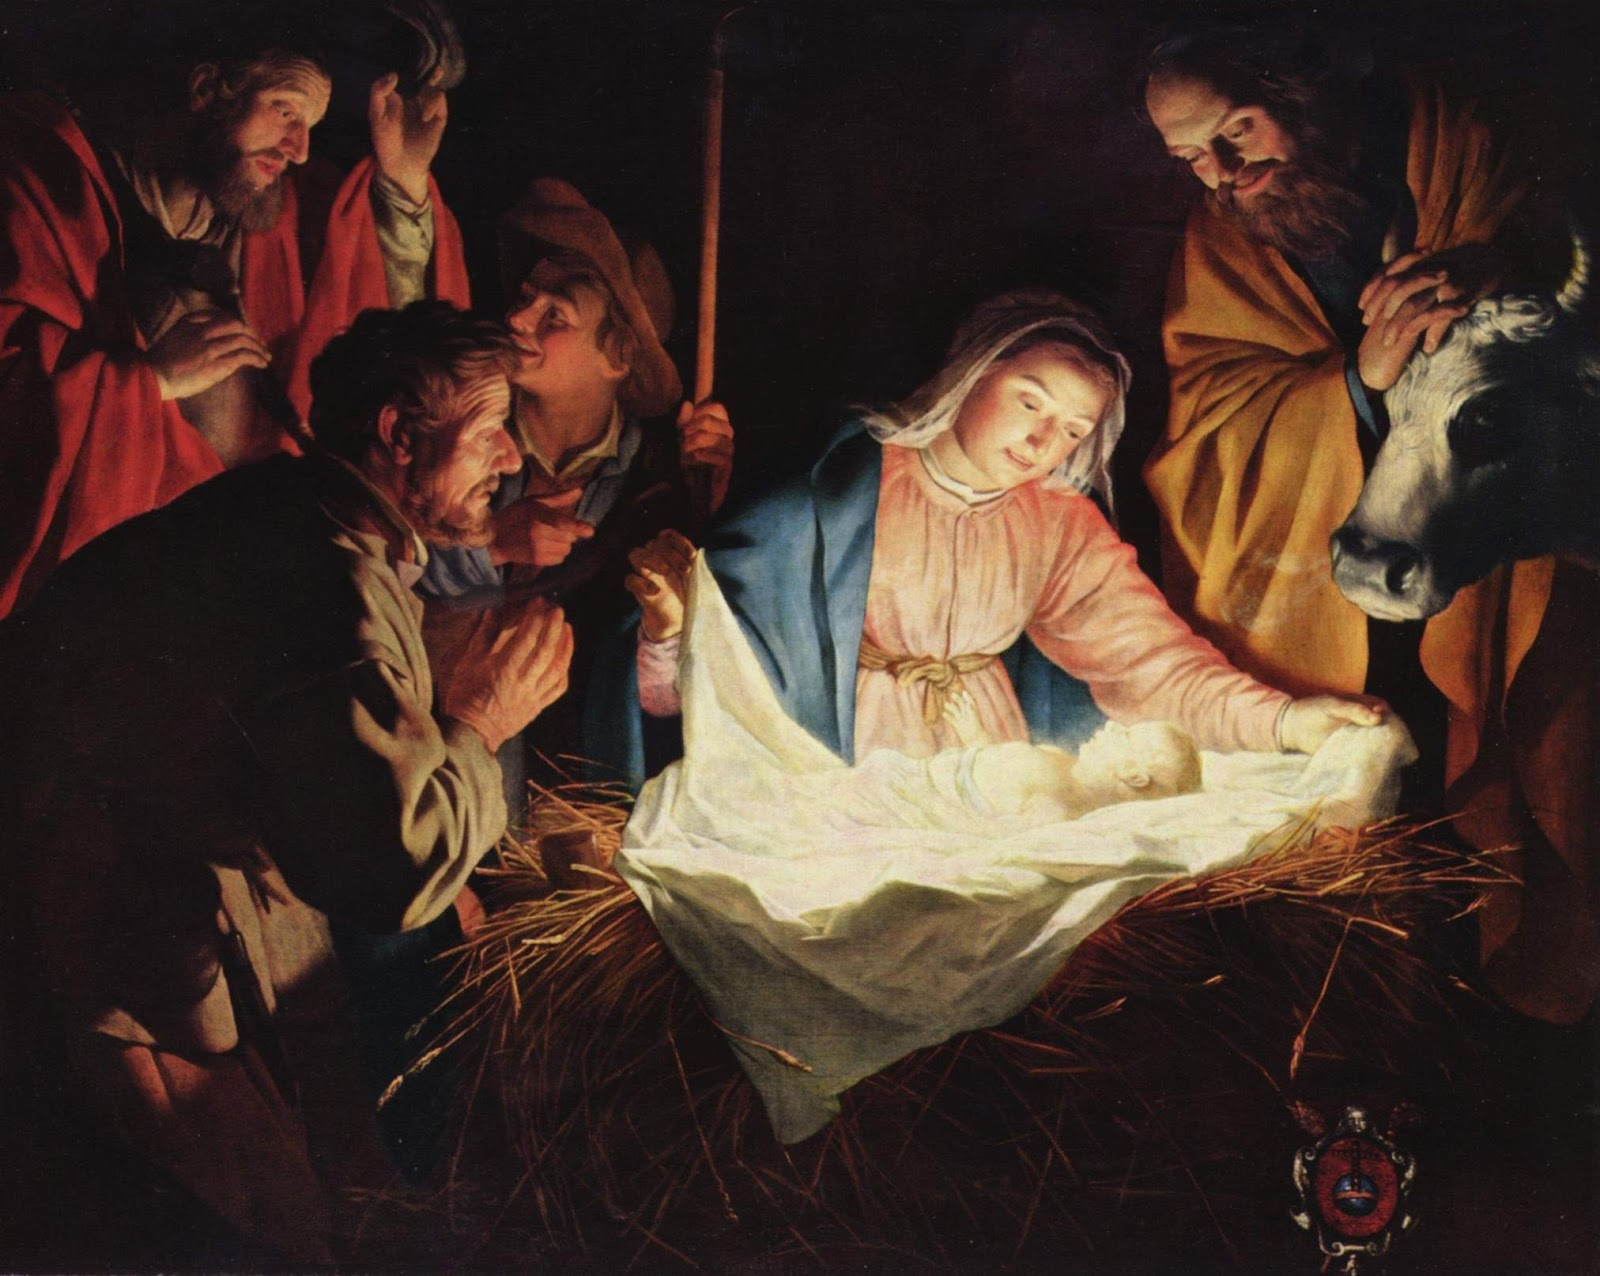 Commemorating Jesus' birth